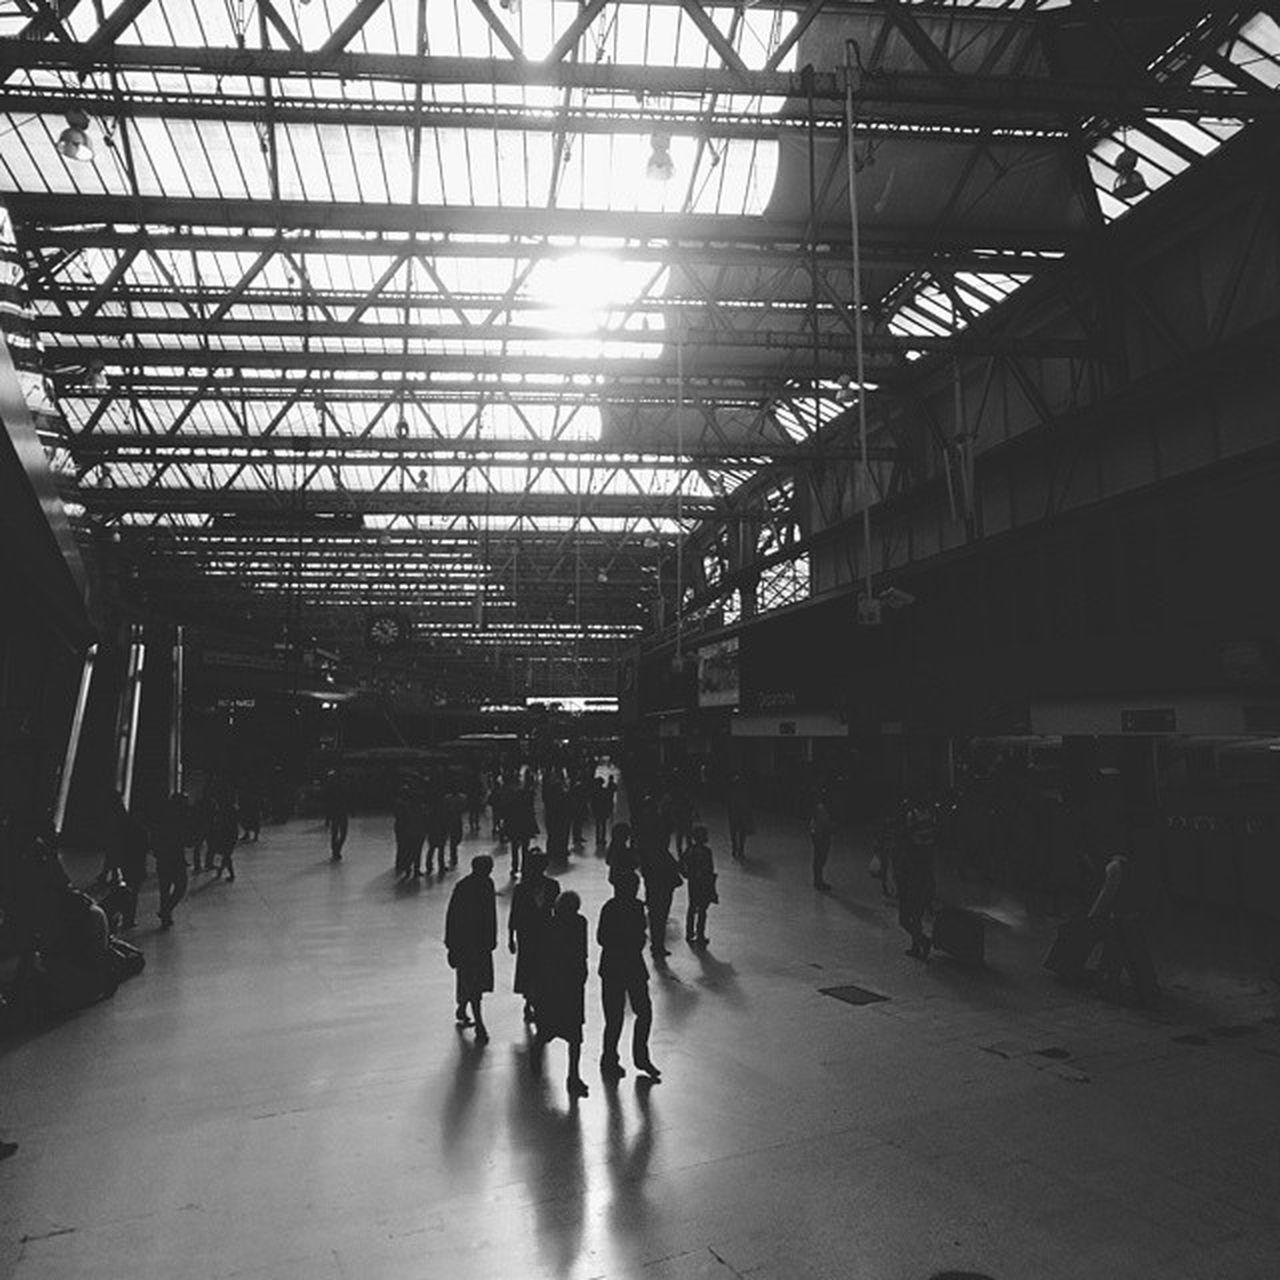 @moment_lens wide Vsco B2 Waterloostation London Momentwide Nexus5 vsco vscocam train bw blackandwhite light shapes shadow photooftheday bestoftheday life cool instadaily vscohub people